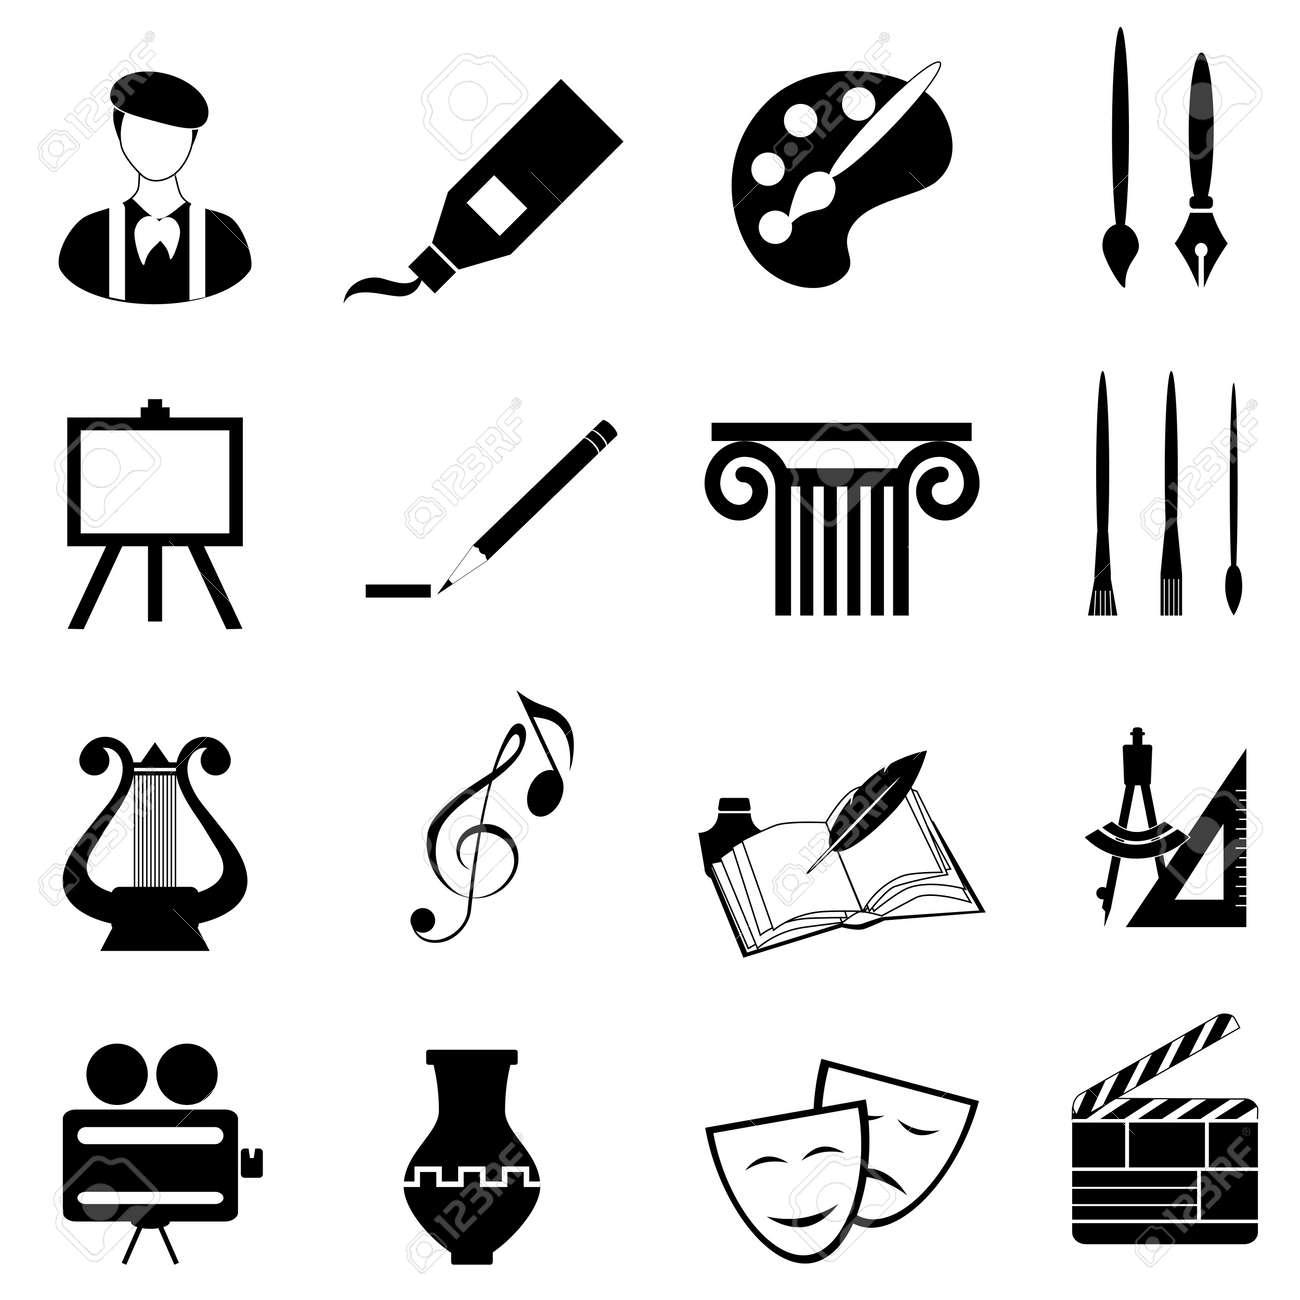 Arts icon set in black - 14843352